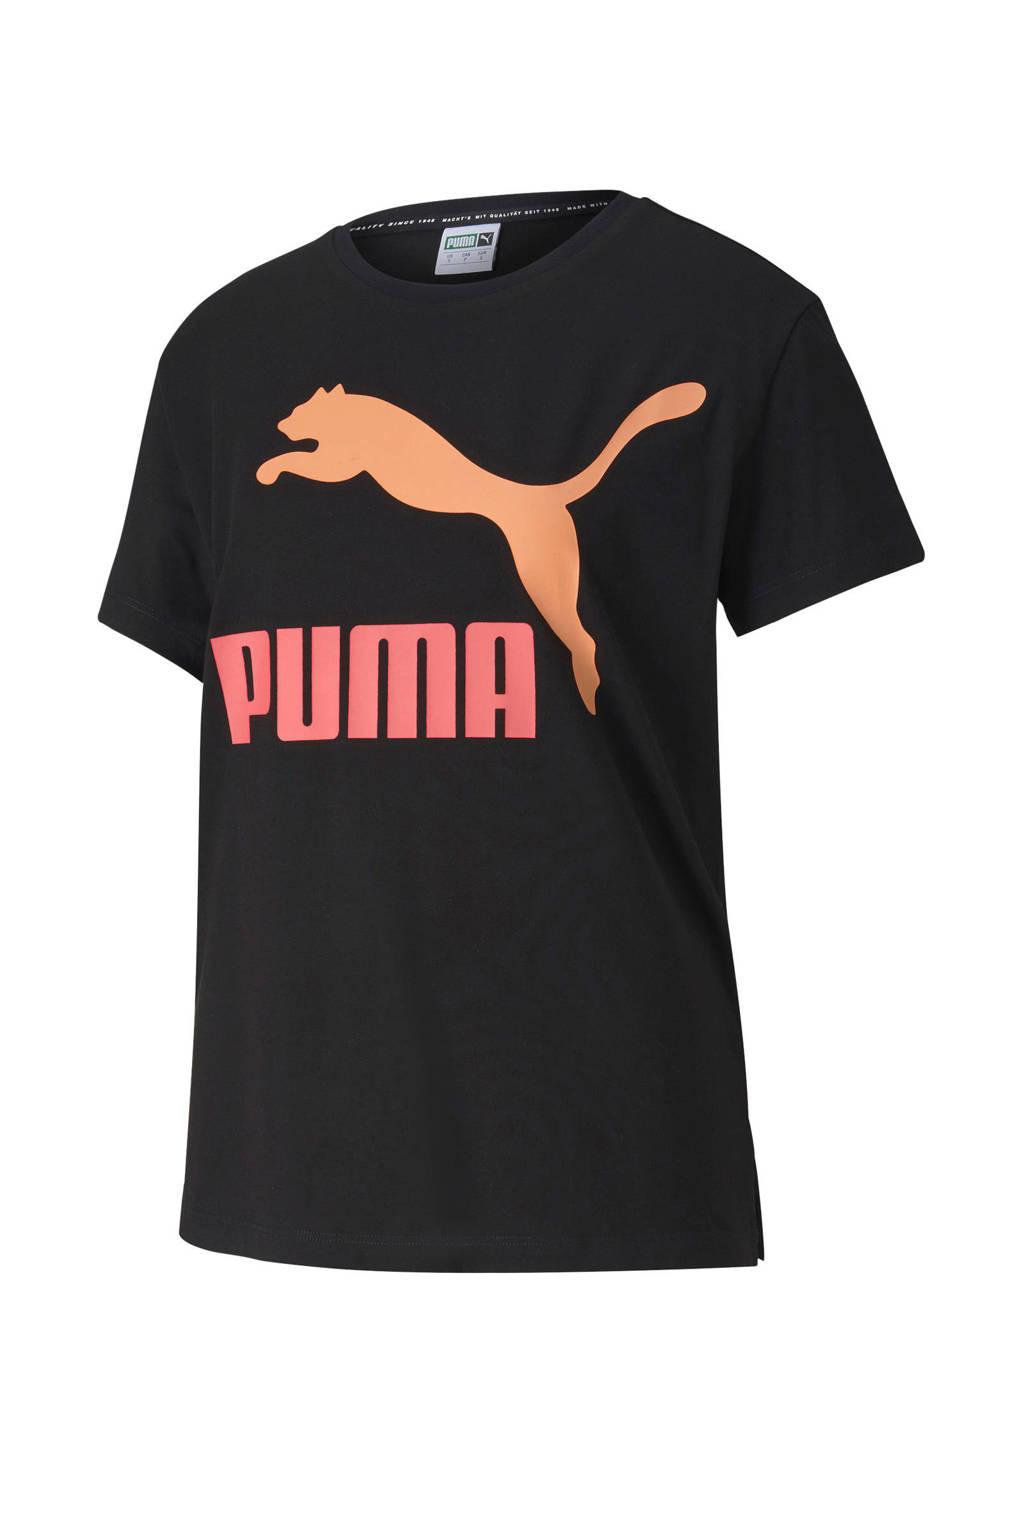 Puma sport T-shirt zwart, Zwart/oranje/koraalrood